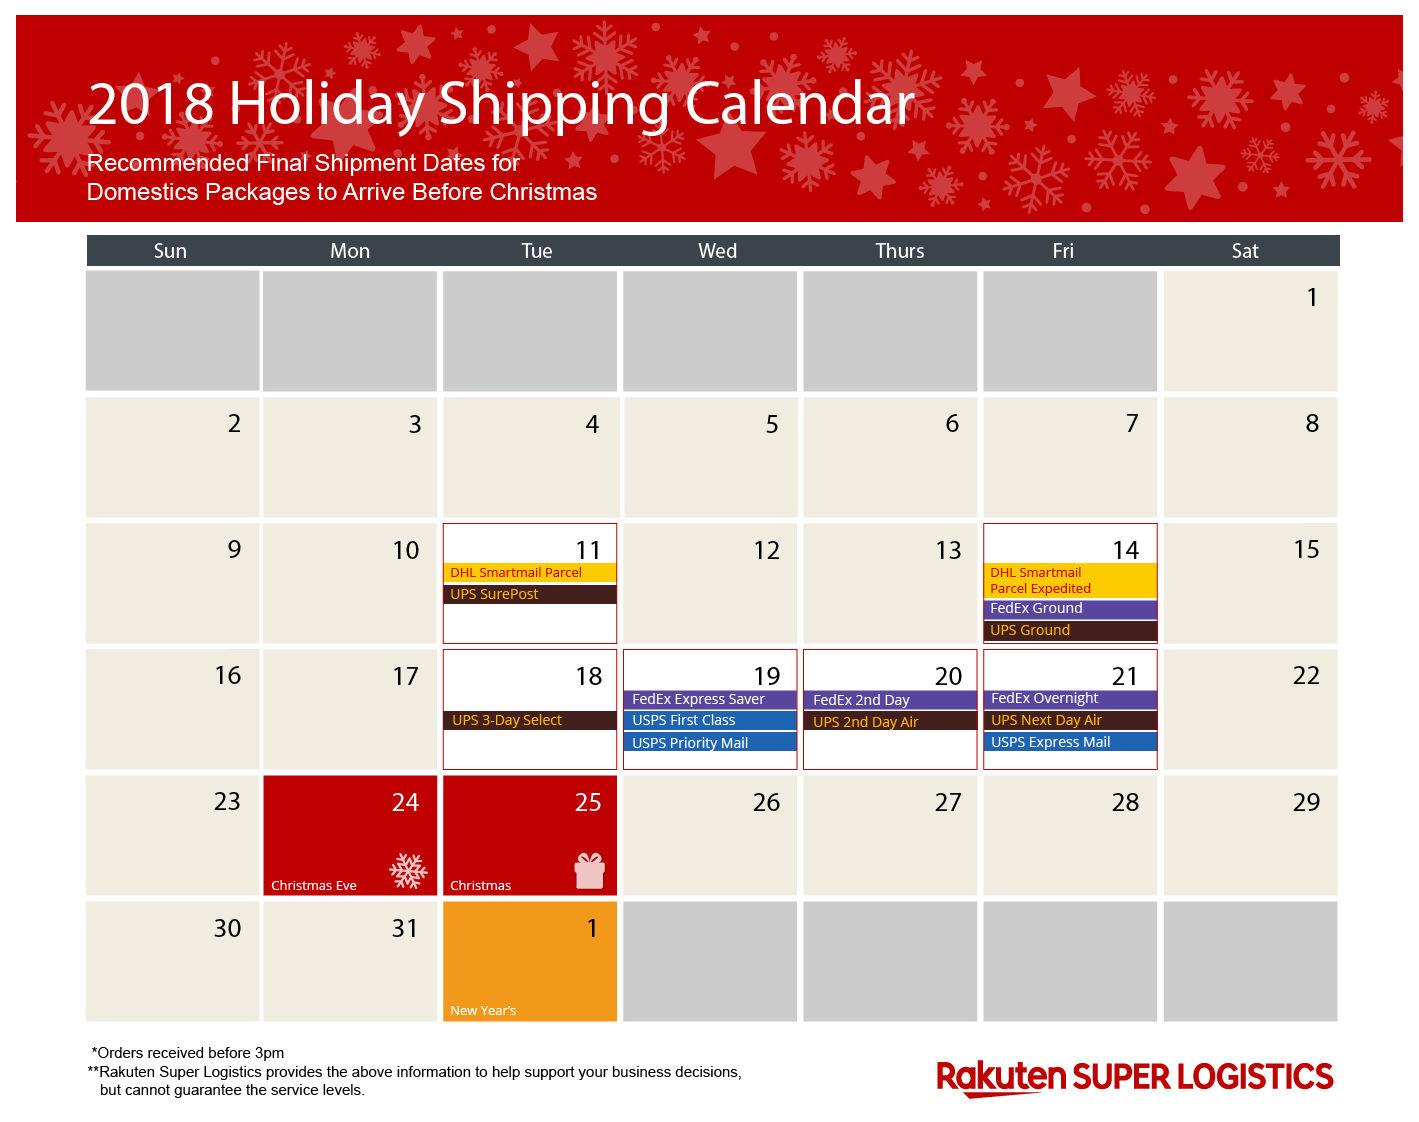 2018 Holiday Shipping Calendar RSL